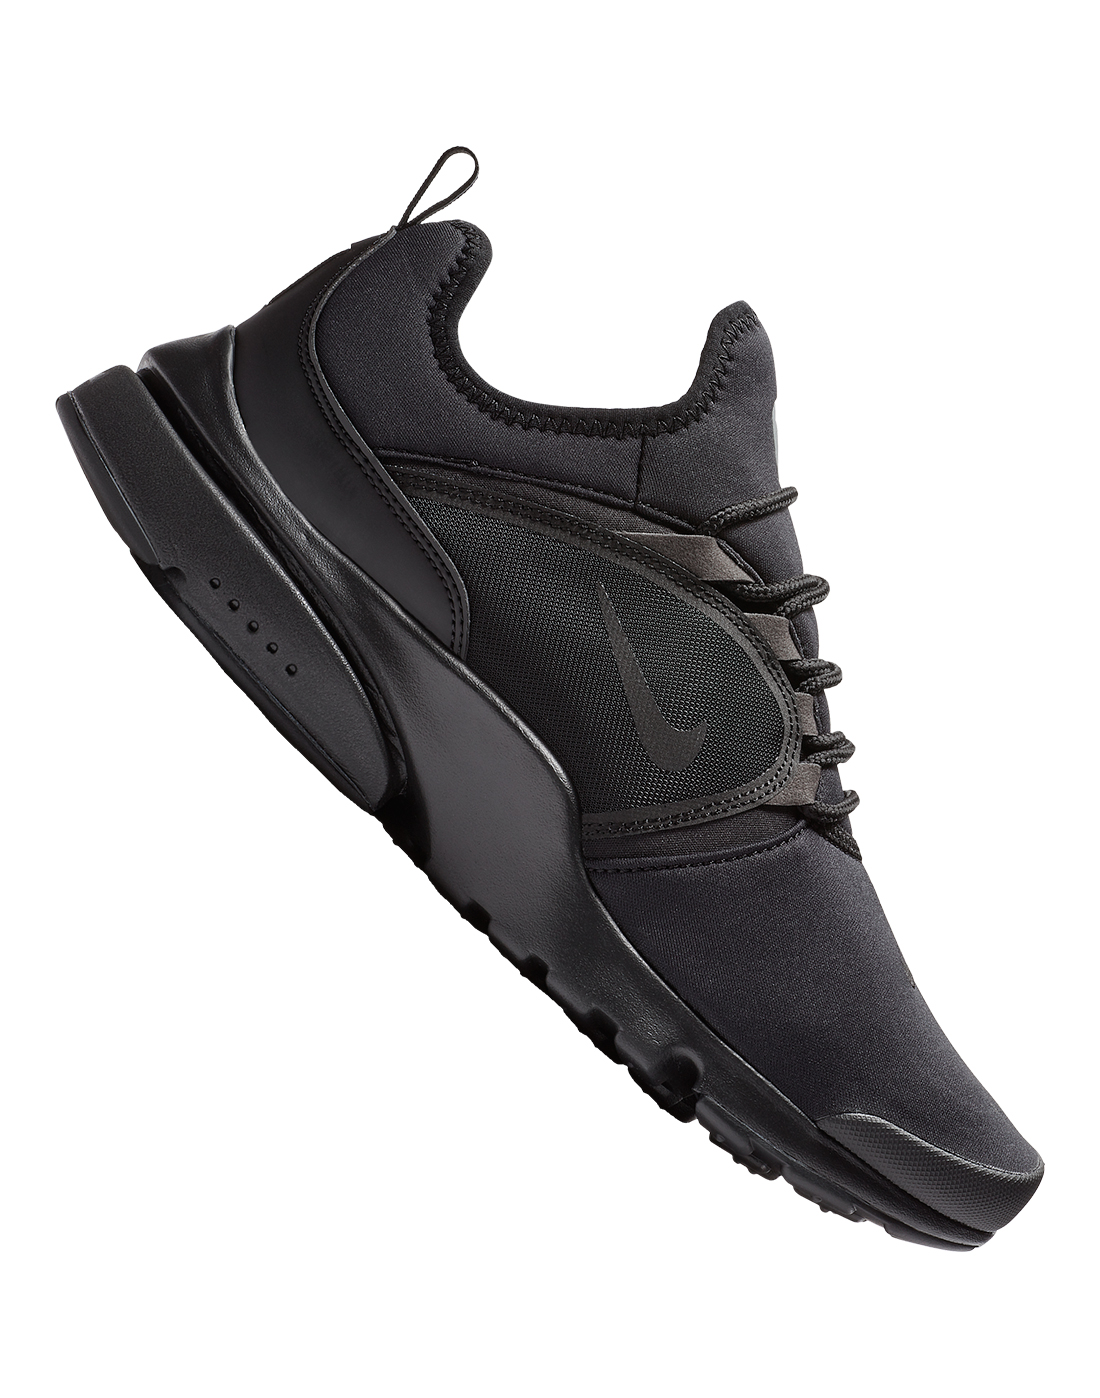 Triple Black Nike Presto Fly World